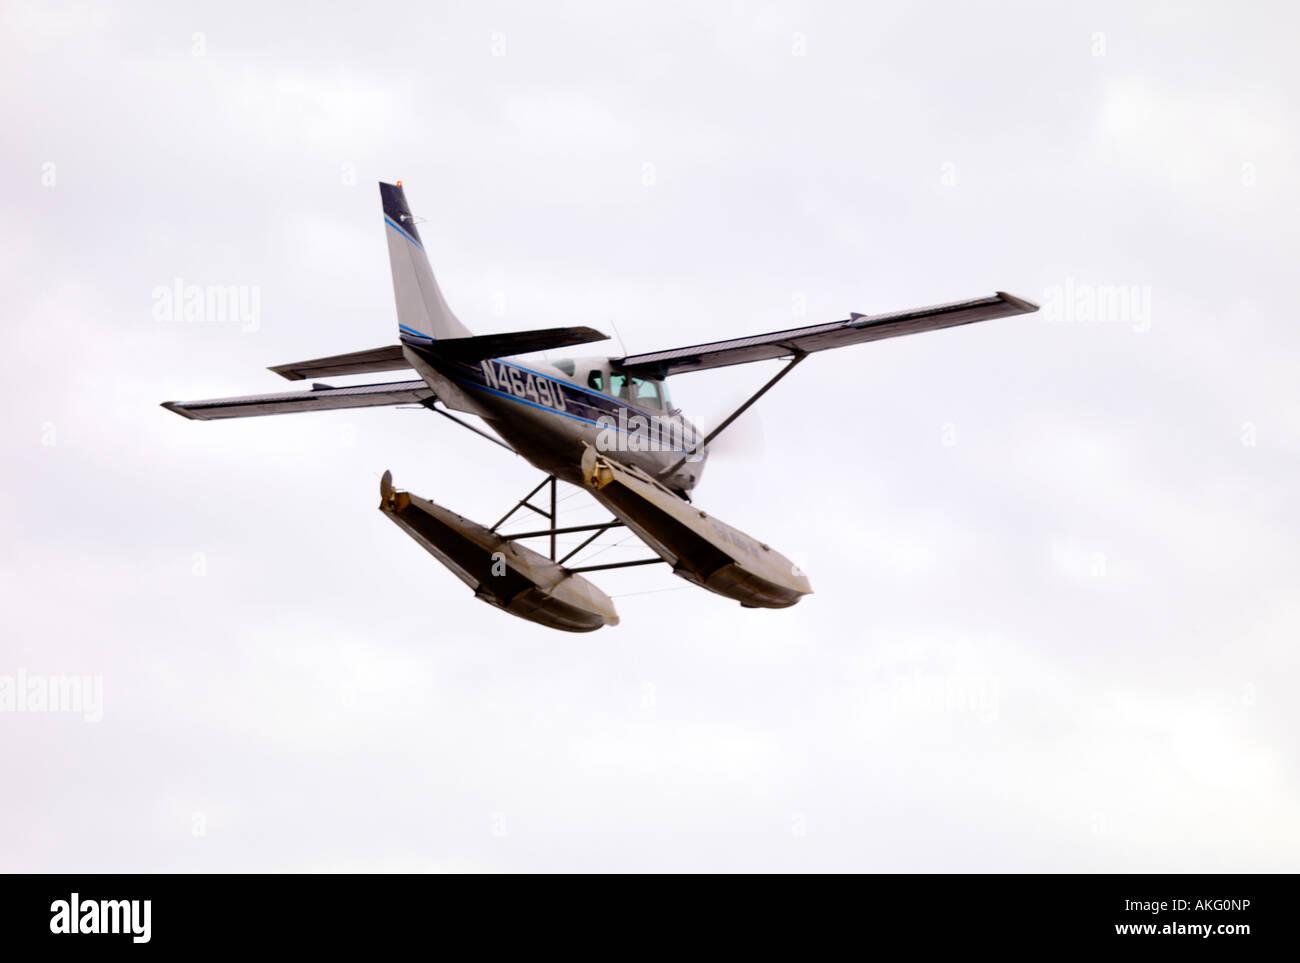 Cessna 206 Floatplane Stock Photos & Cessna 206 Floatplane Stock